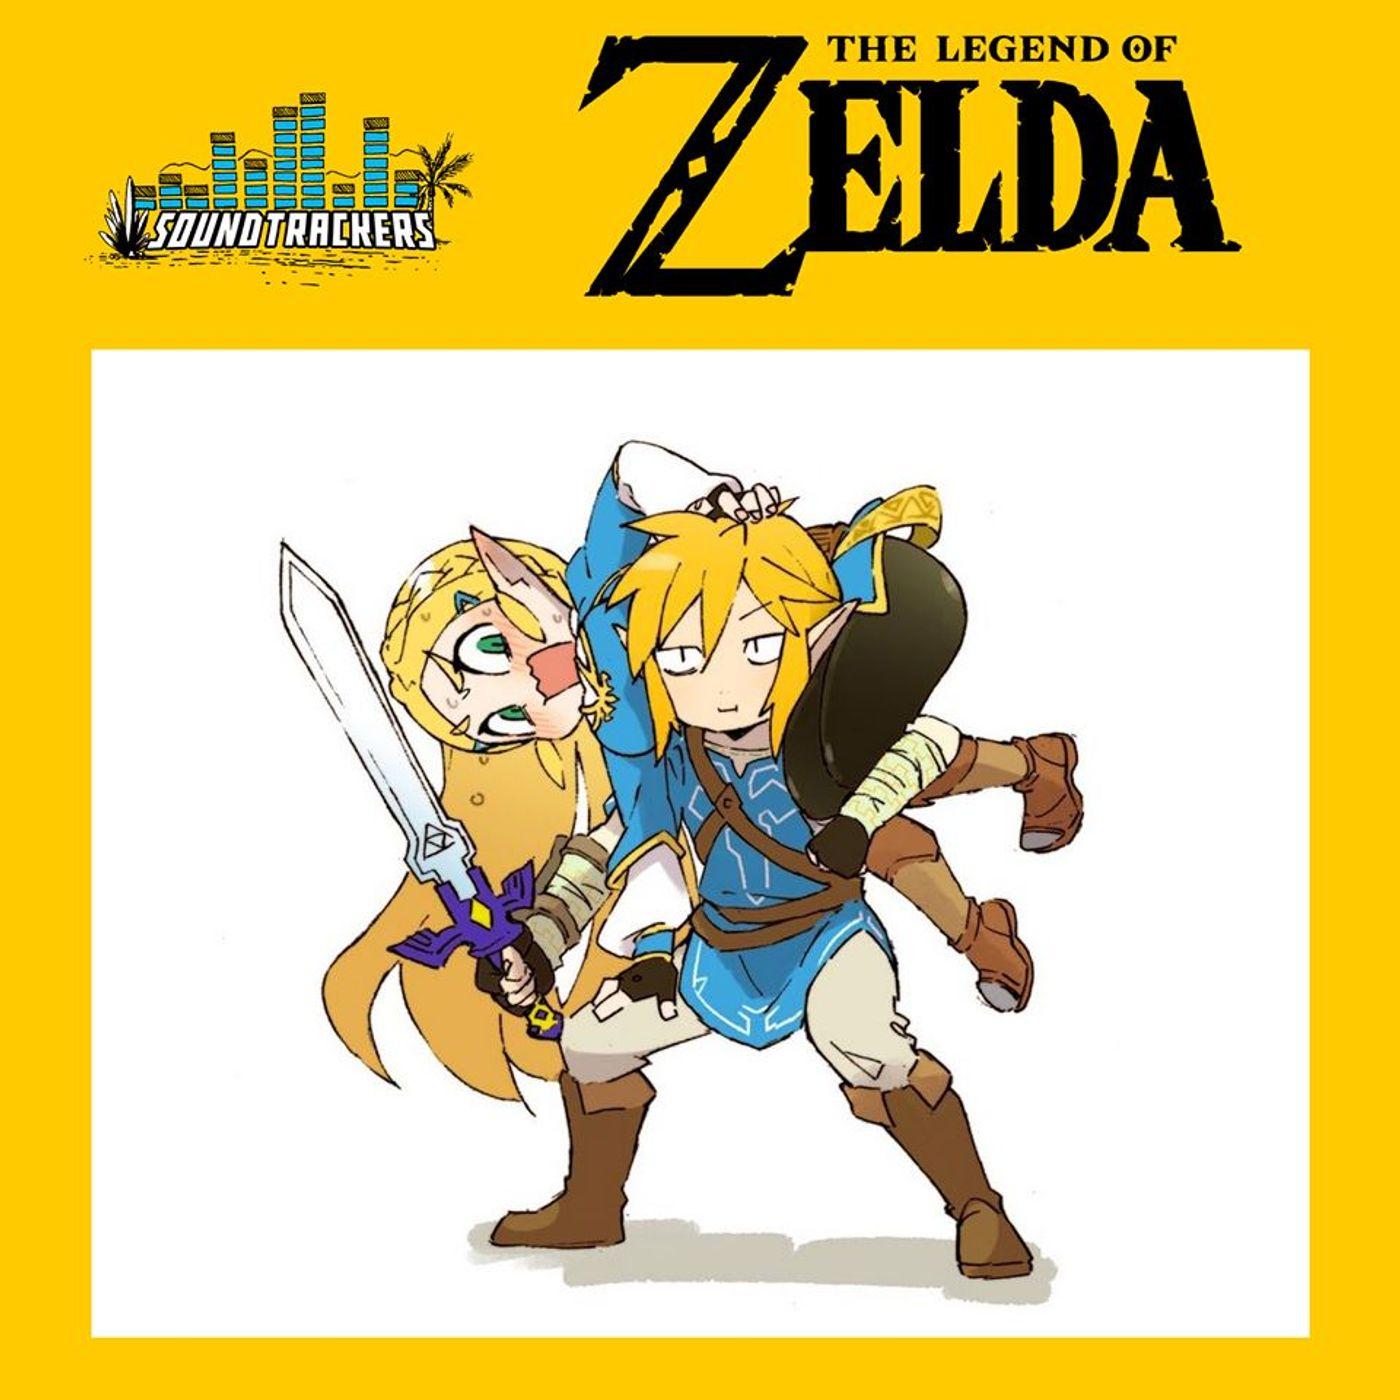 Episodio 10 - The Legend Of Zelda